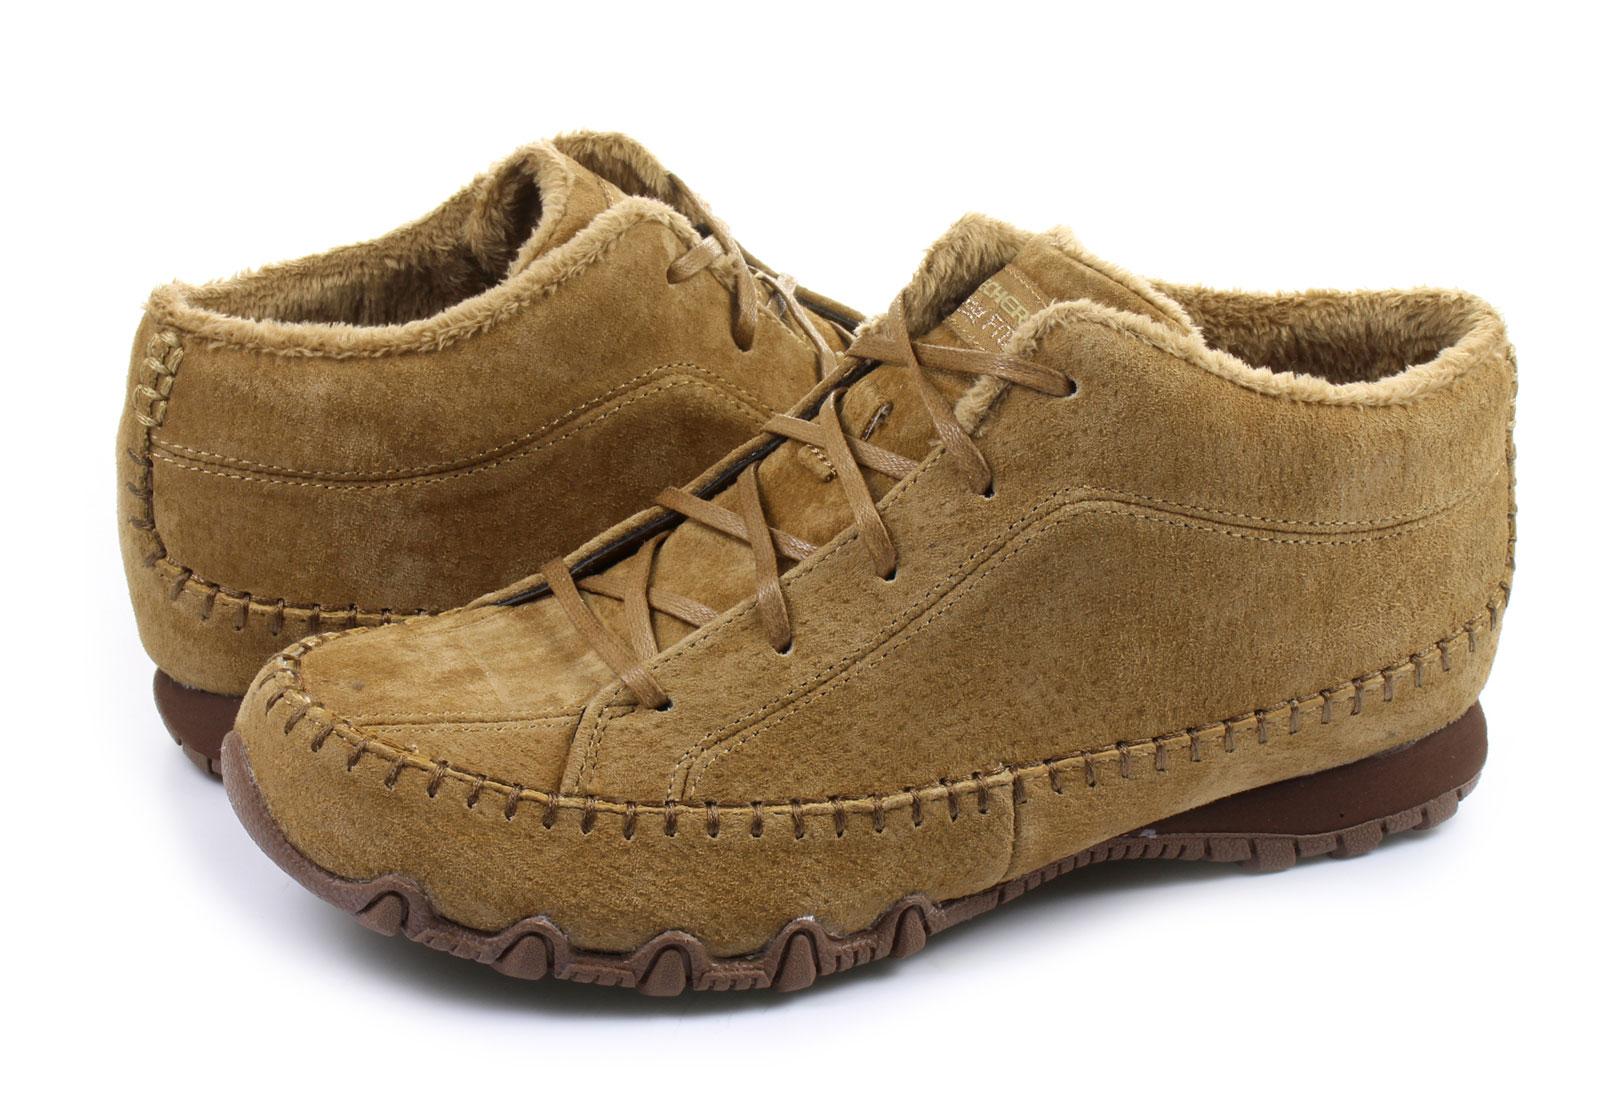 Skechers Cipő - Bikers - 49013-brn - Office Shoes Magyarország 910b291b26